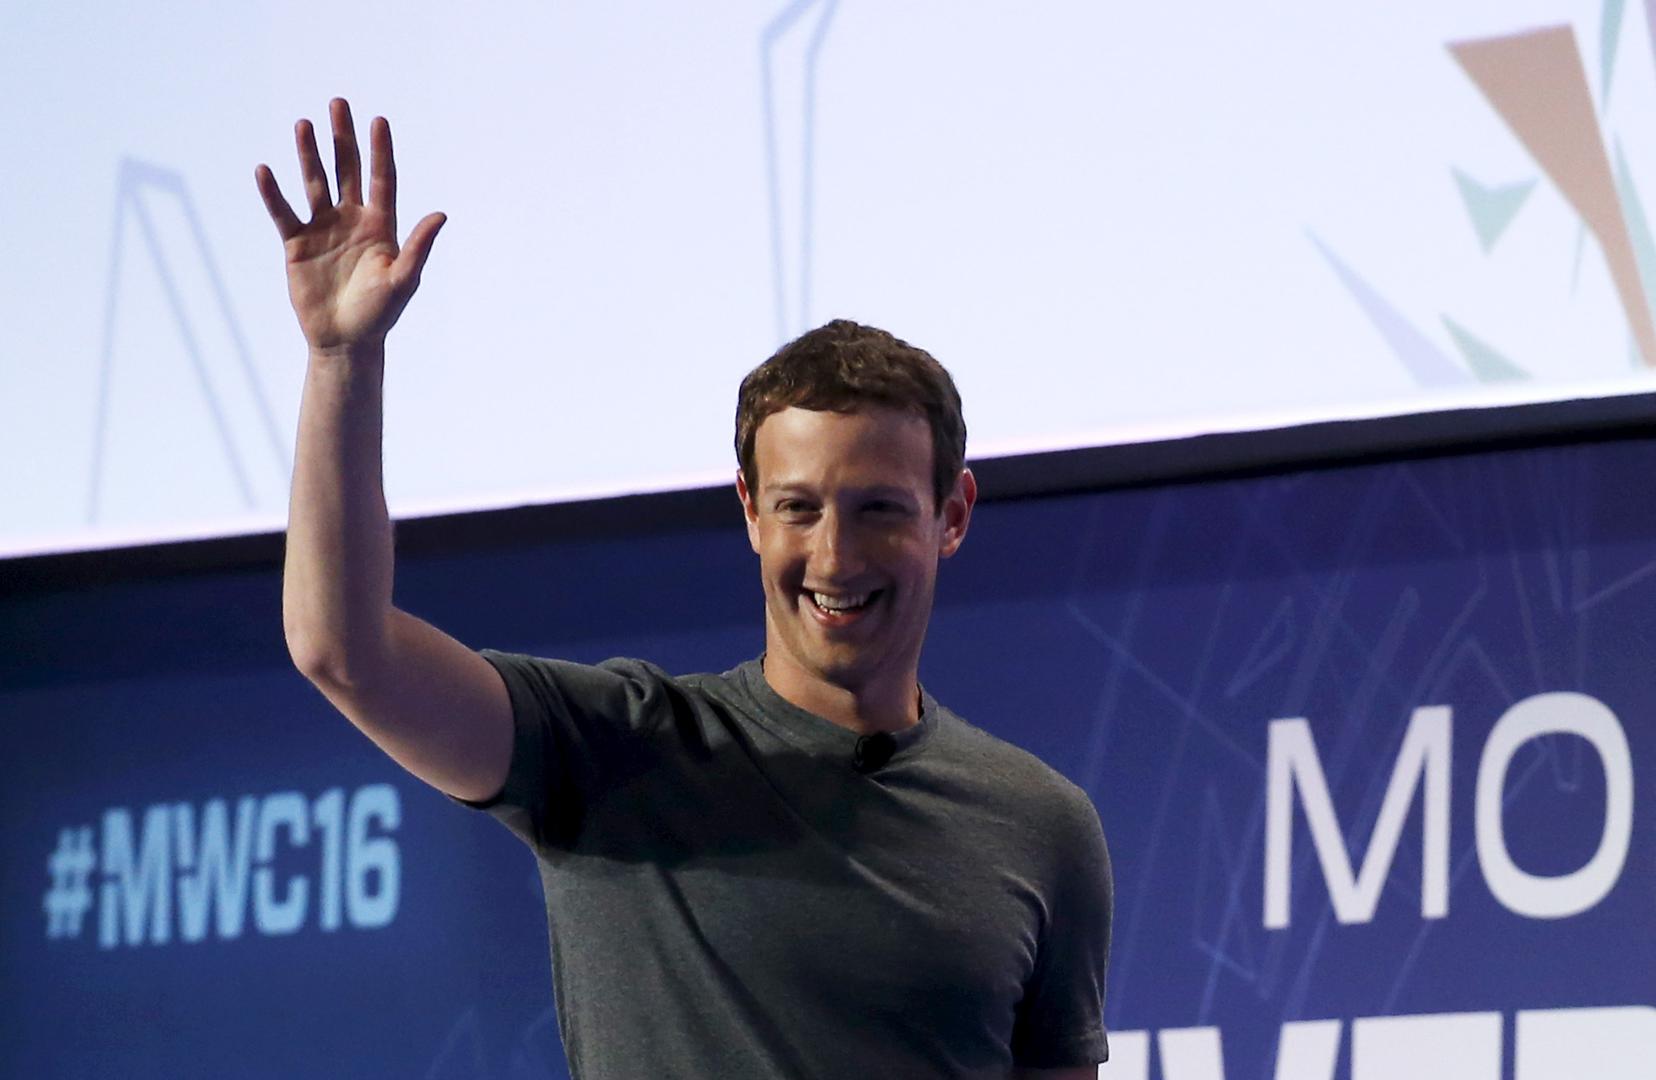 Богач-бедняк: что стоит за имиджем Марка Цукерберга